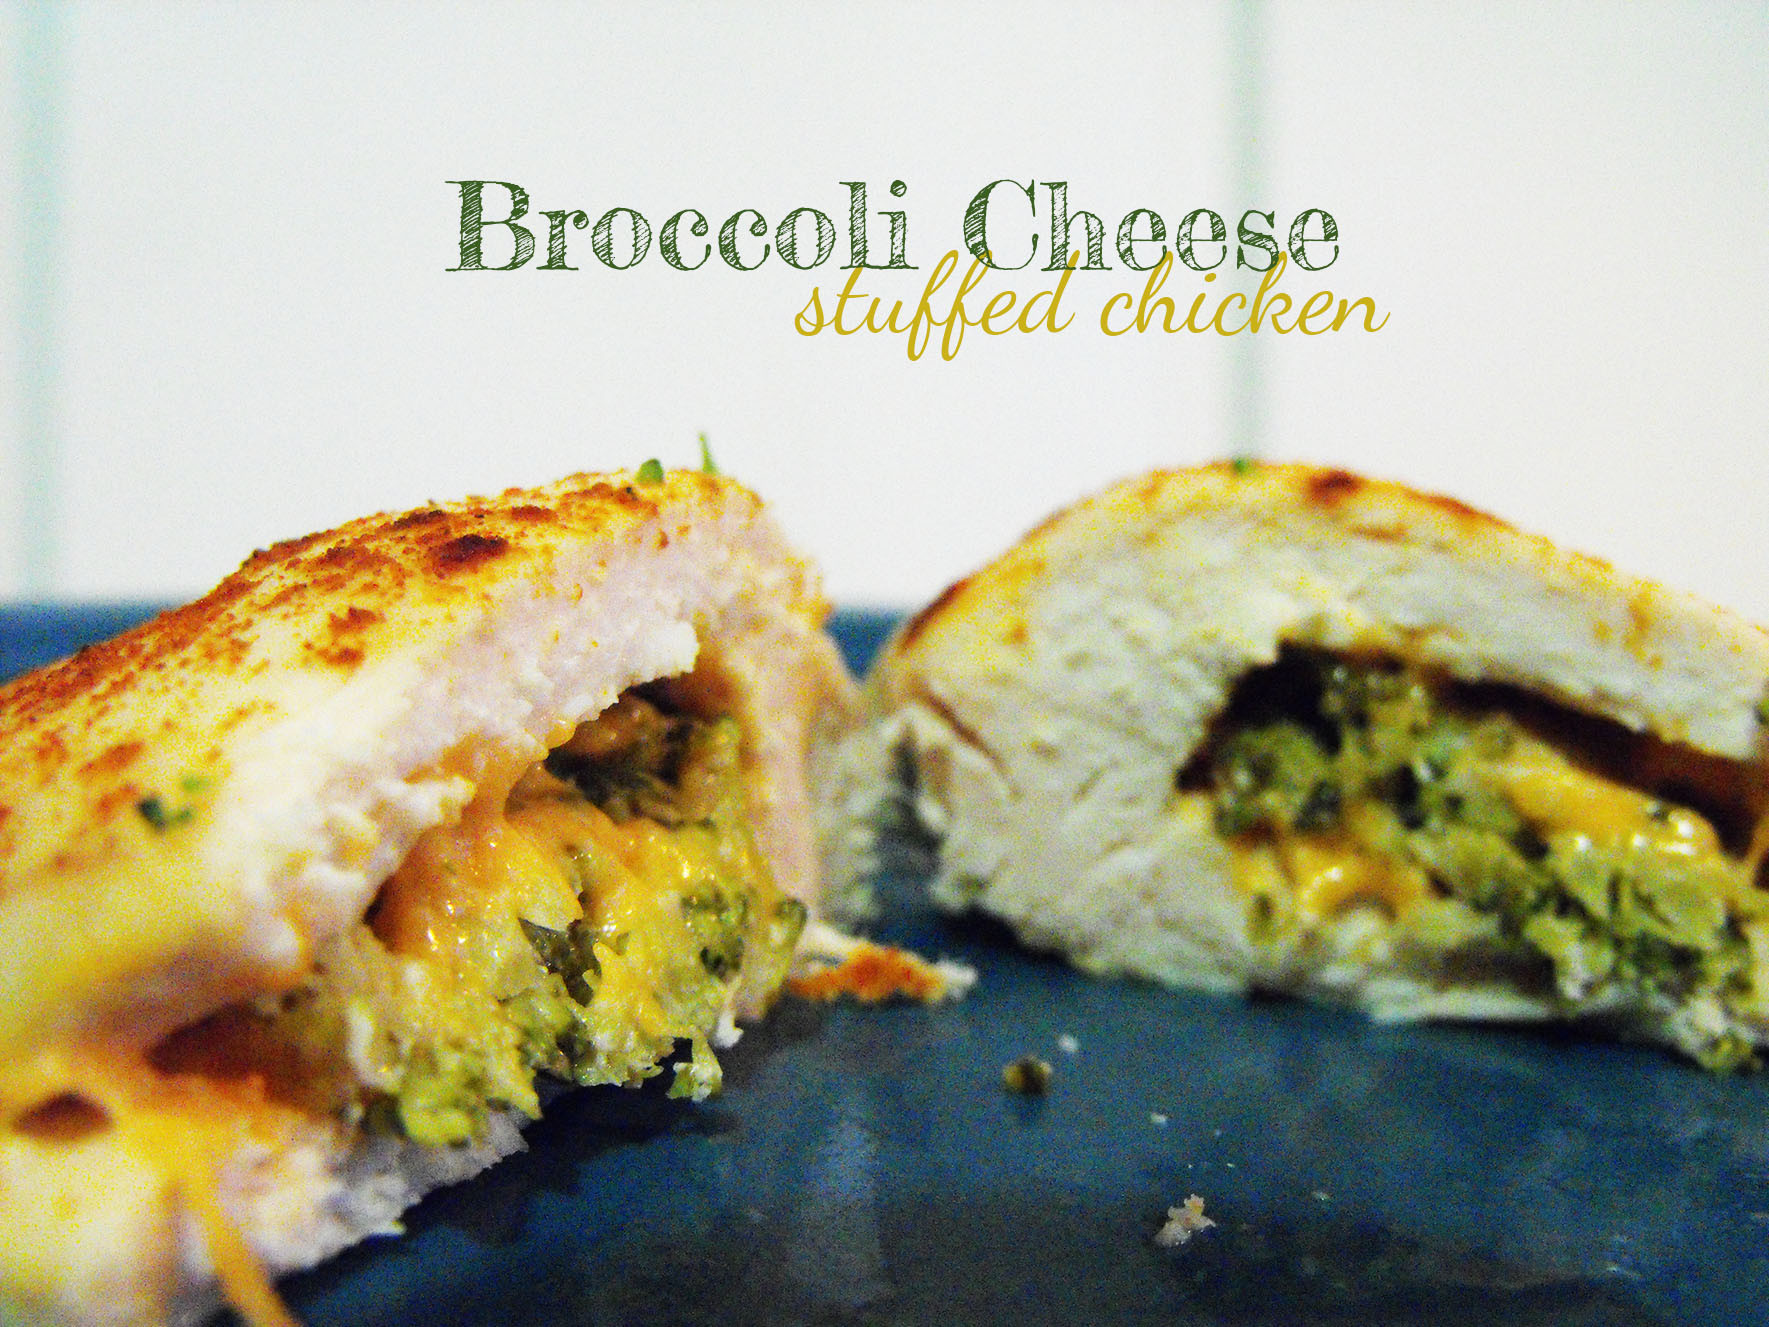 Broccoli Stuffed Chicken  Broccoli Cheese Stuffed Chicken Saving the Family Money